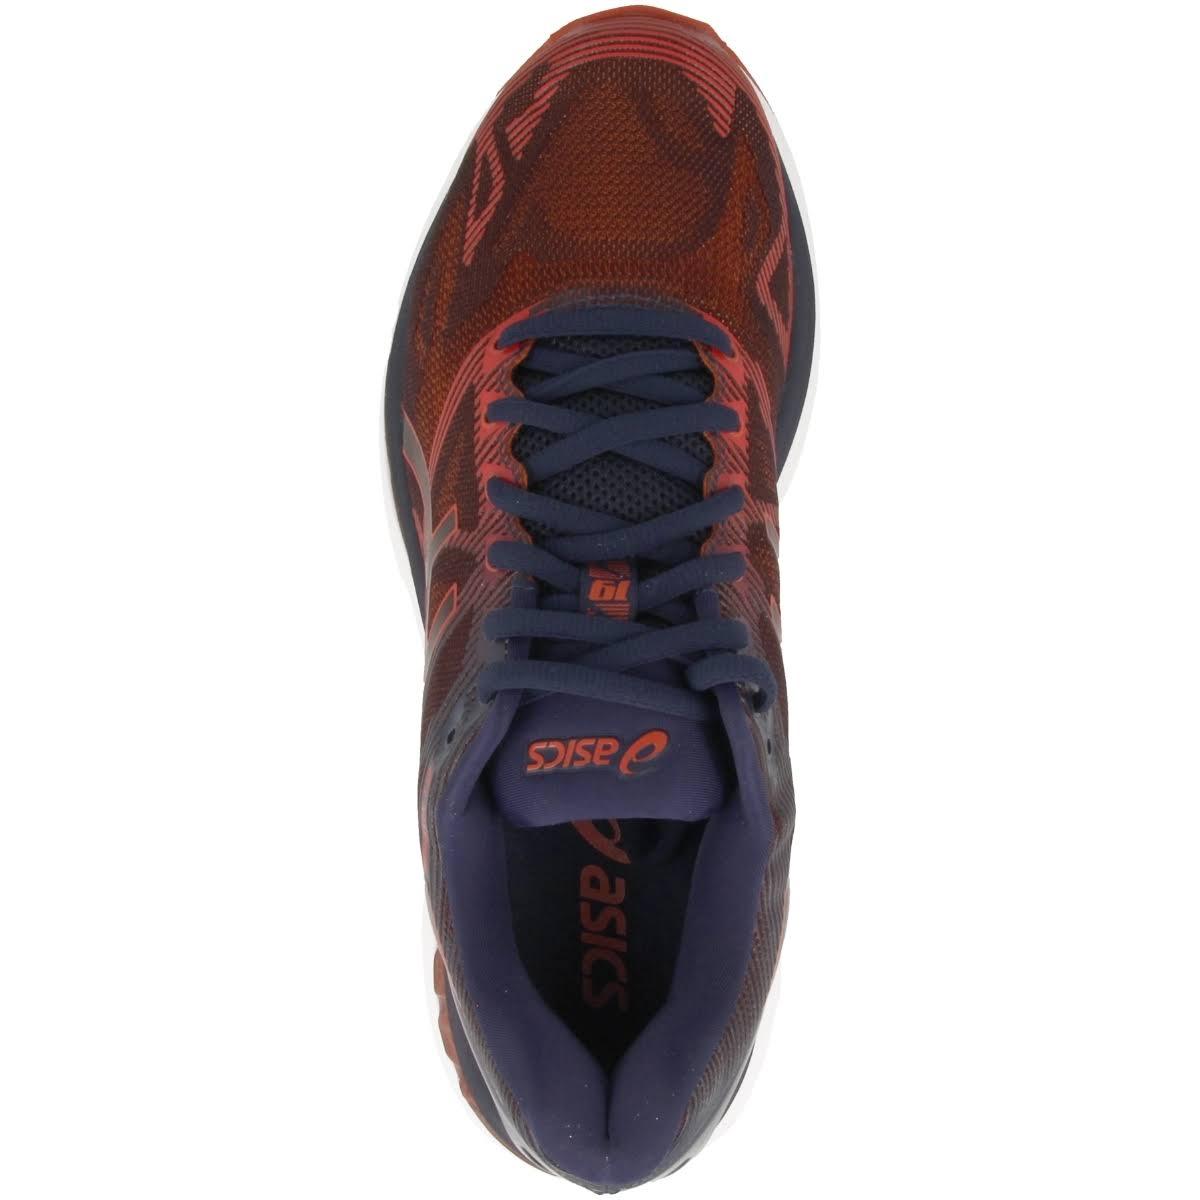 Rot 19 Gelnimbus Schuhe Laufschuh 42 Größe Blau Herren Neutral Asics zUqd5xfwq